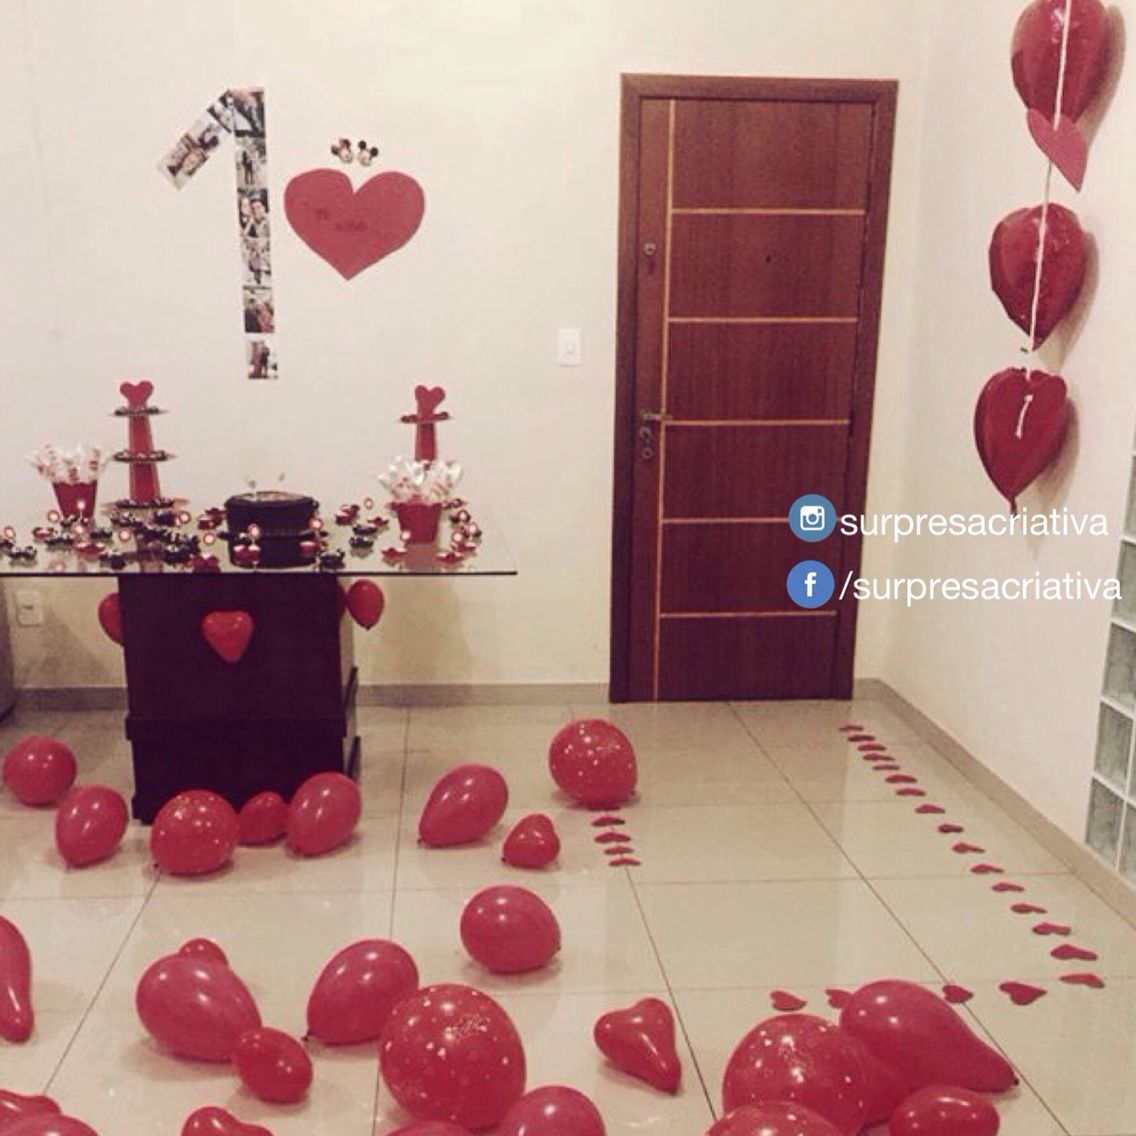 Instagram com surpresacriativa Surpresas Namoro  ~ Quarto Romantico Para Namorado